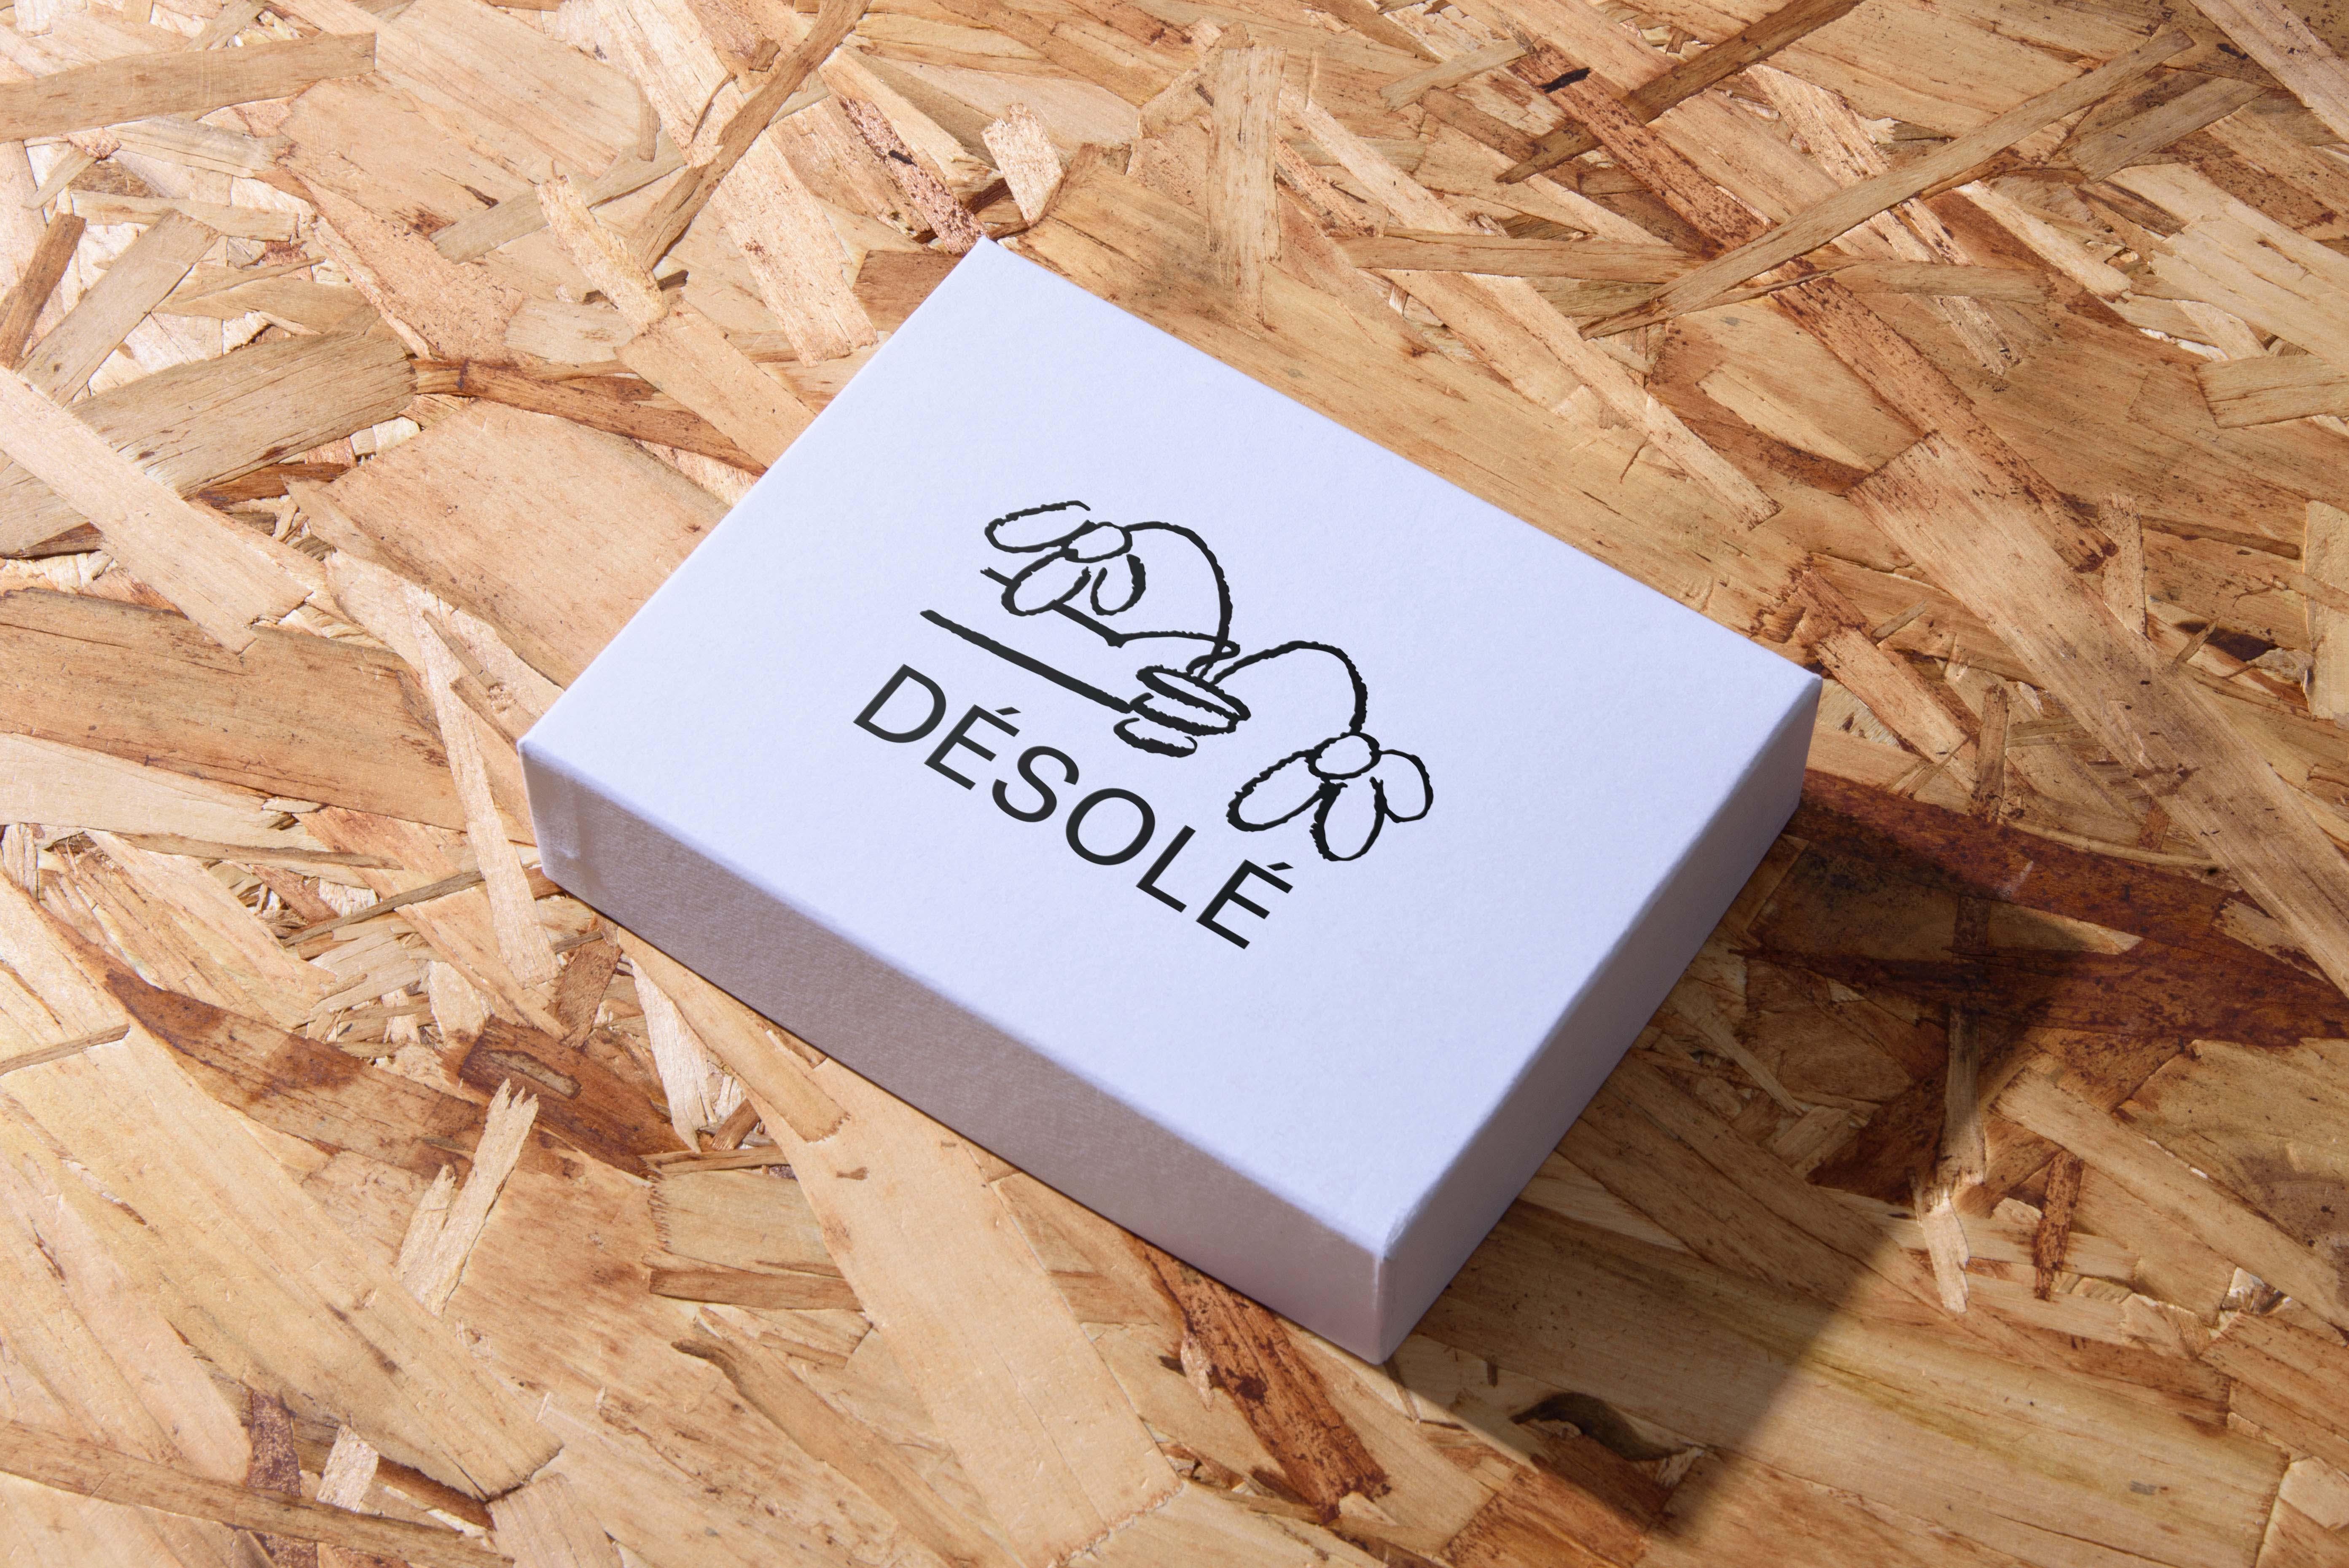 Désolé branding on packaging